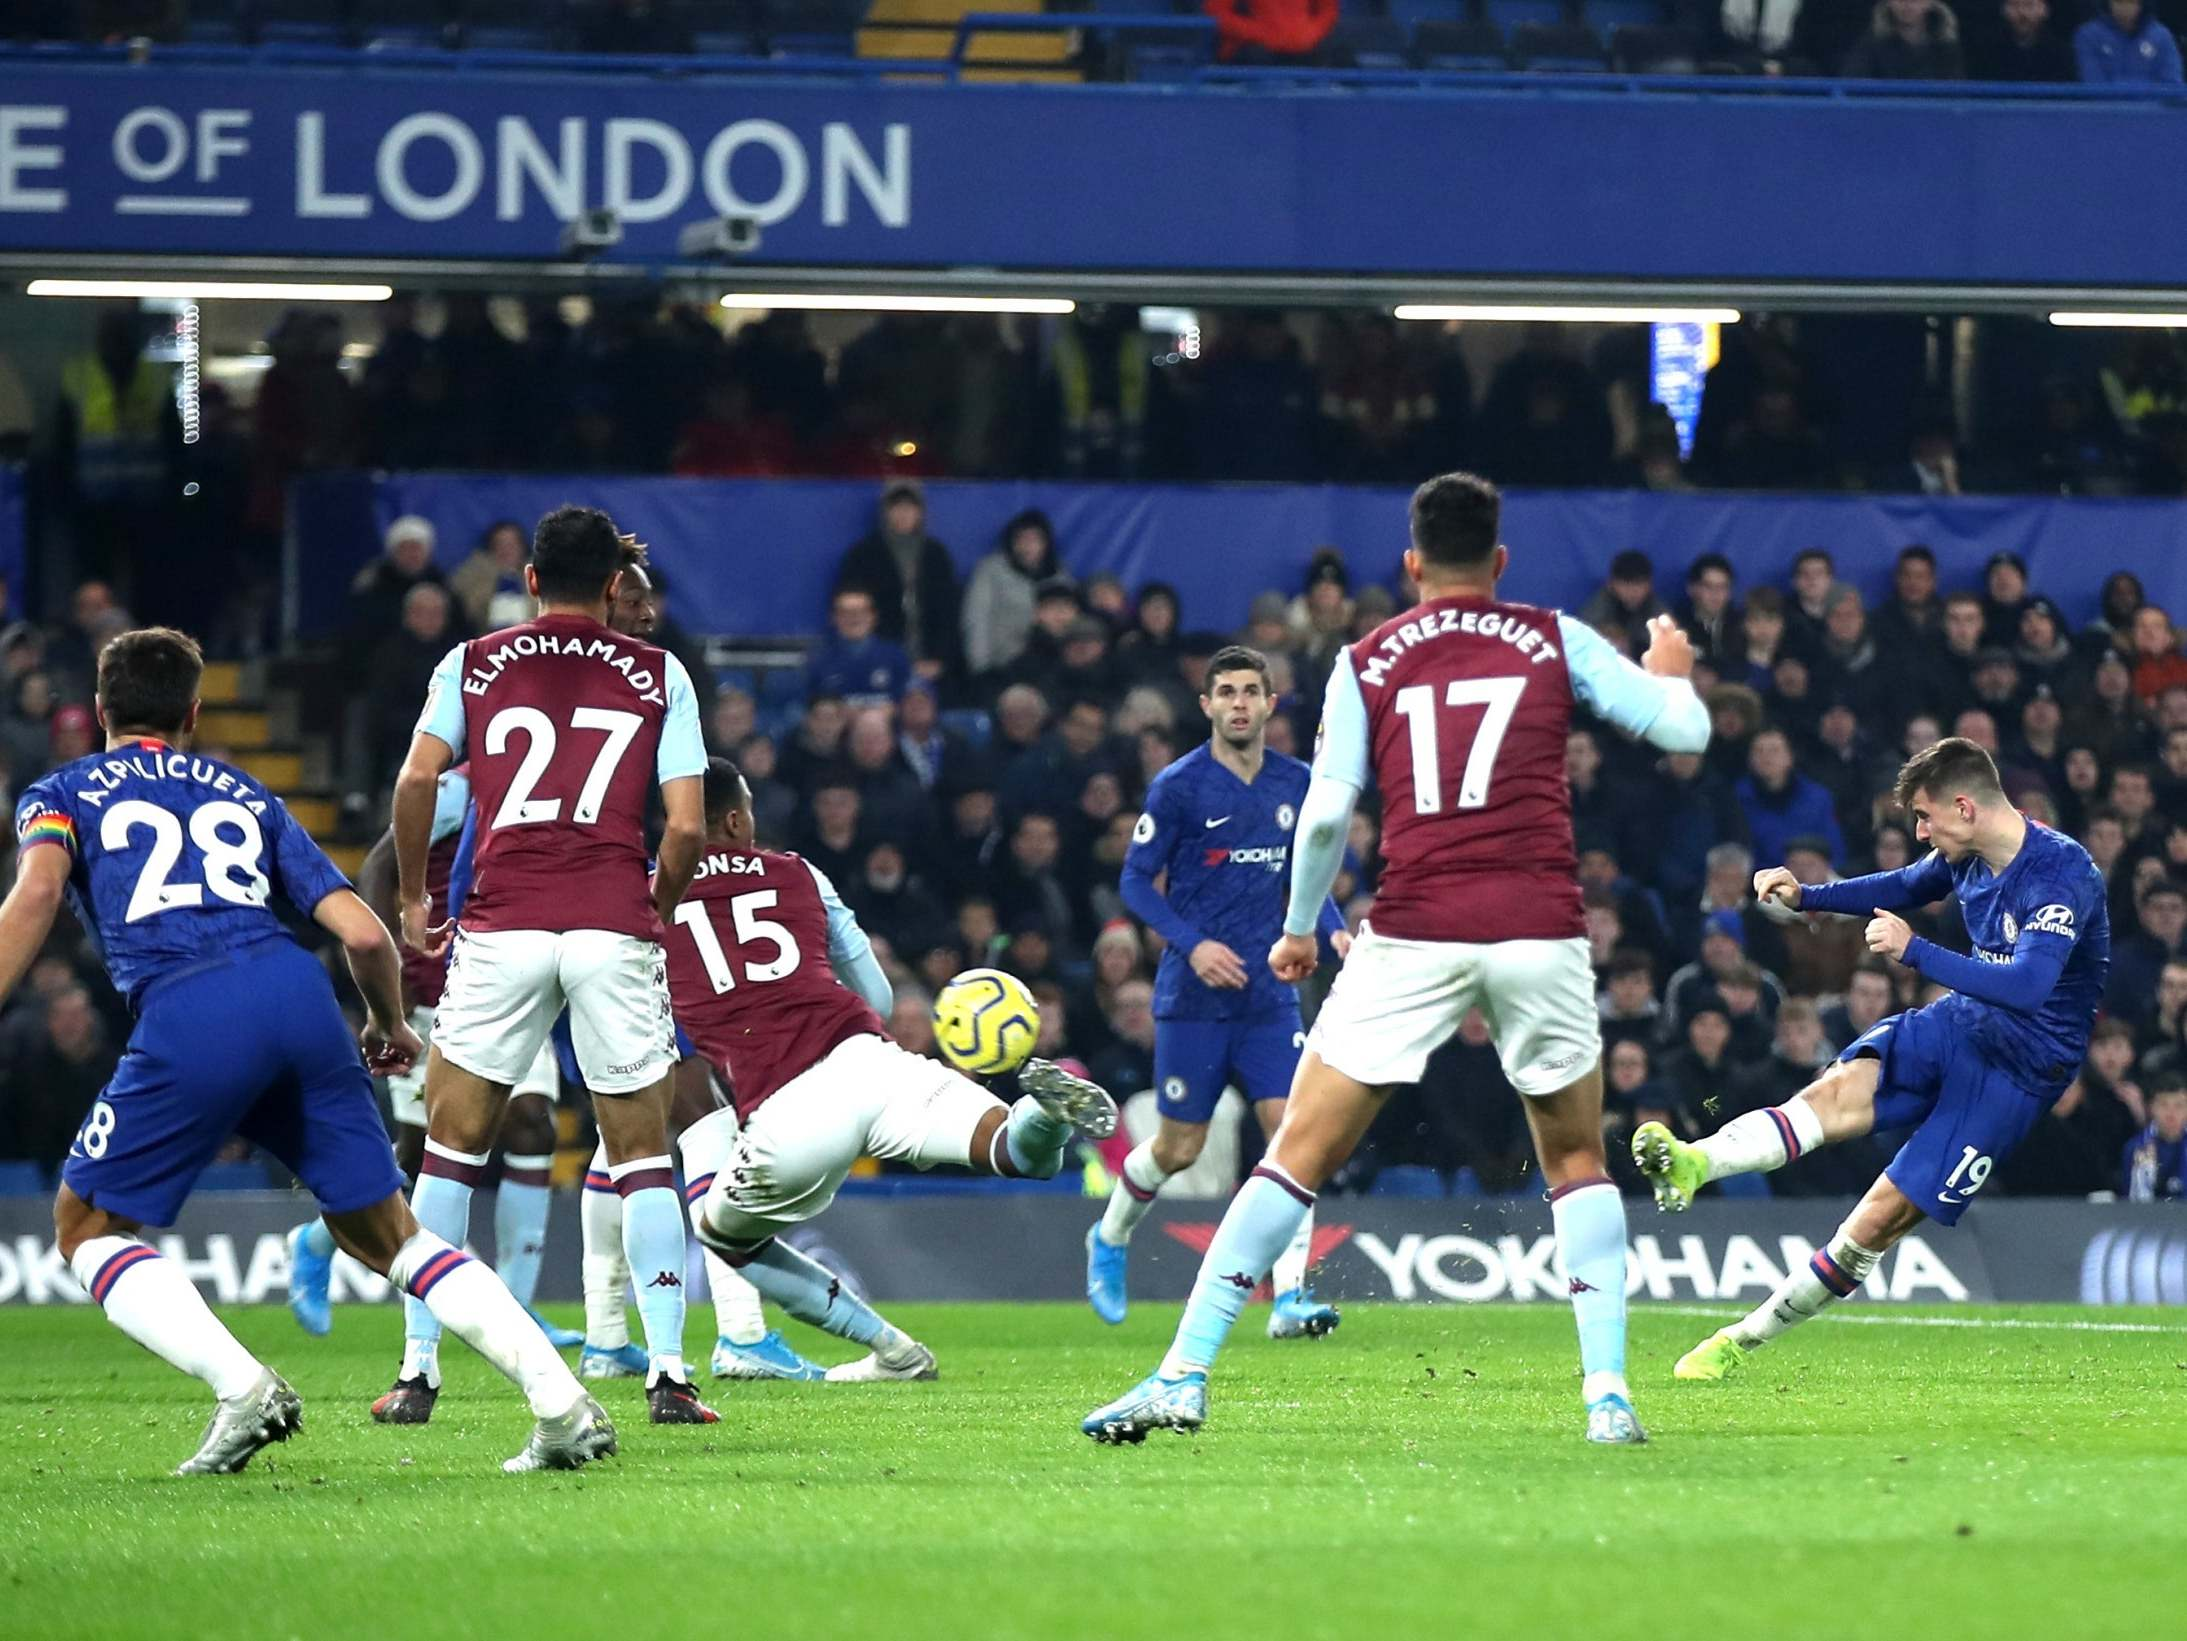 Chelsea vs Aston Villa LIVE: Latest score, goals and updates from Premier League fixture tonight